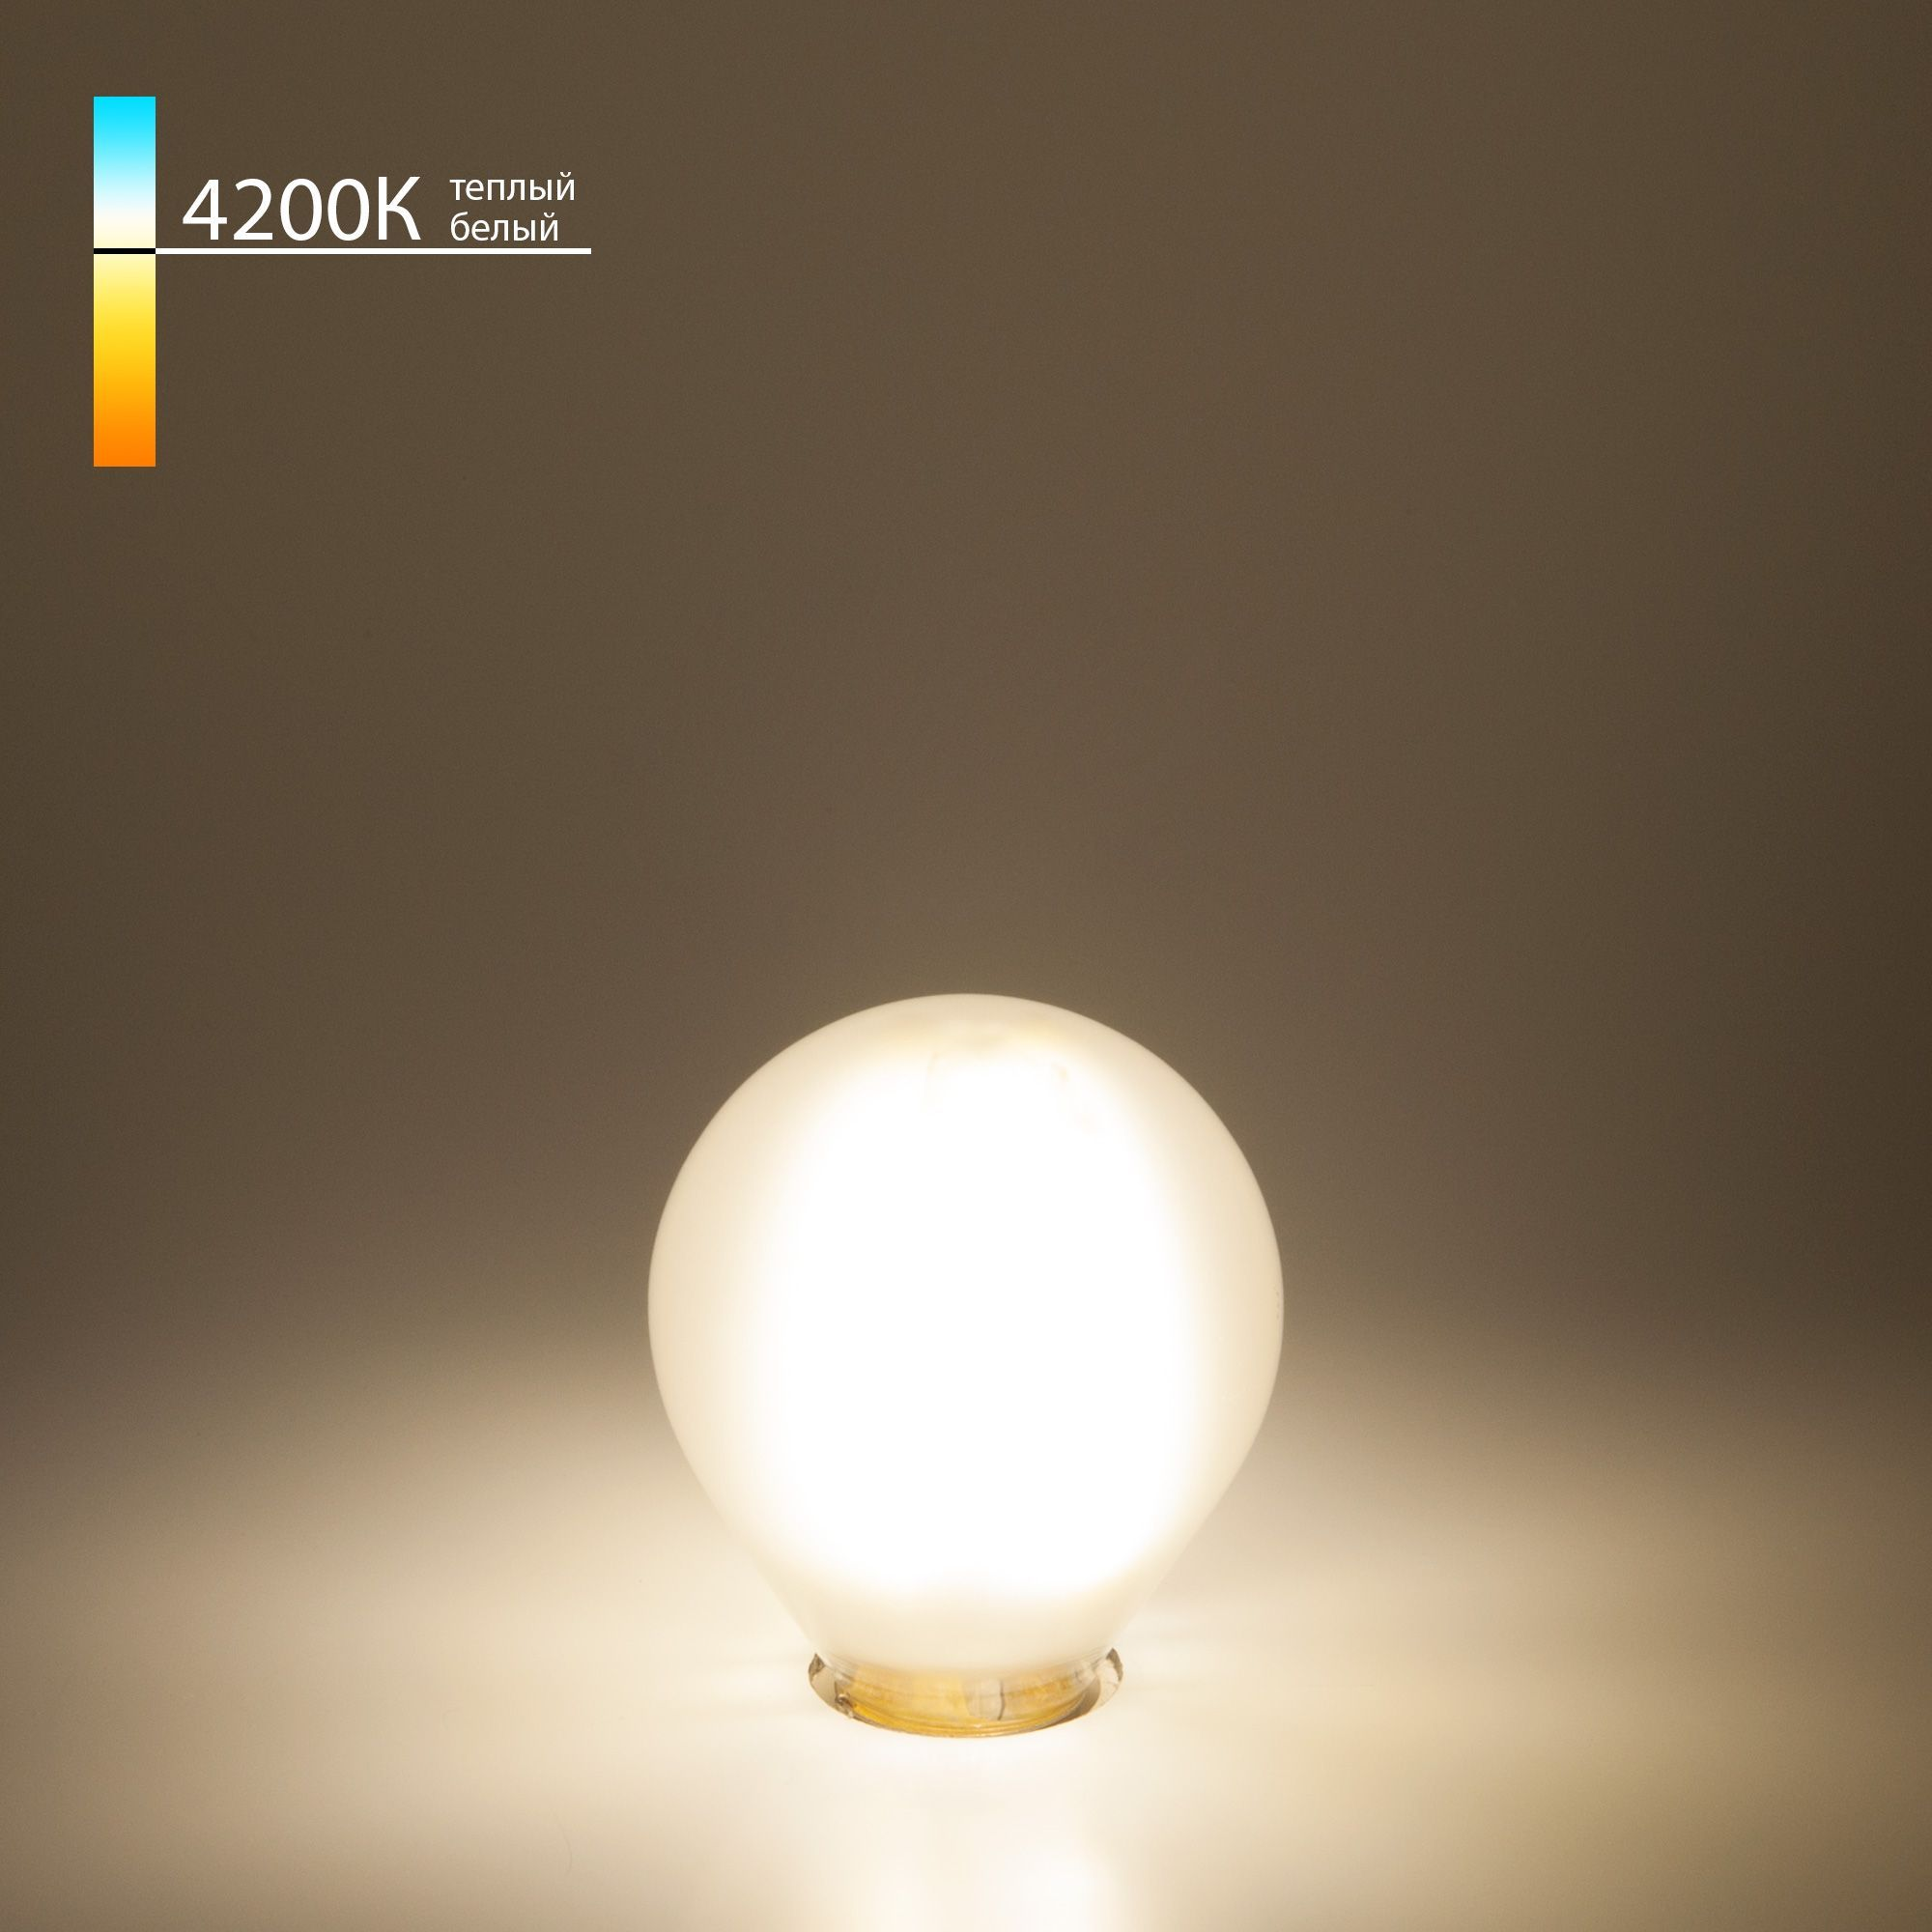 Филаментная светодиодная лампа G45 6W 4200K E14 Classic F 6W 4200K E14 белый матовый